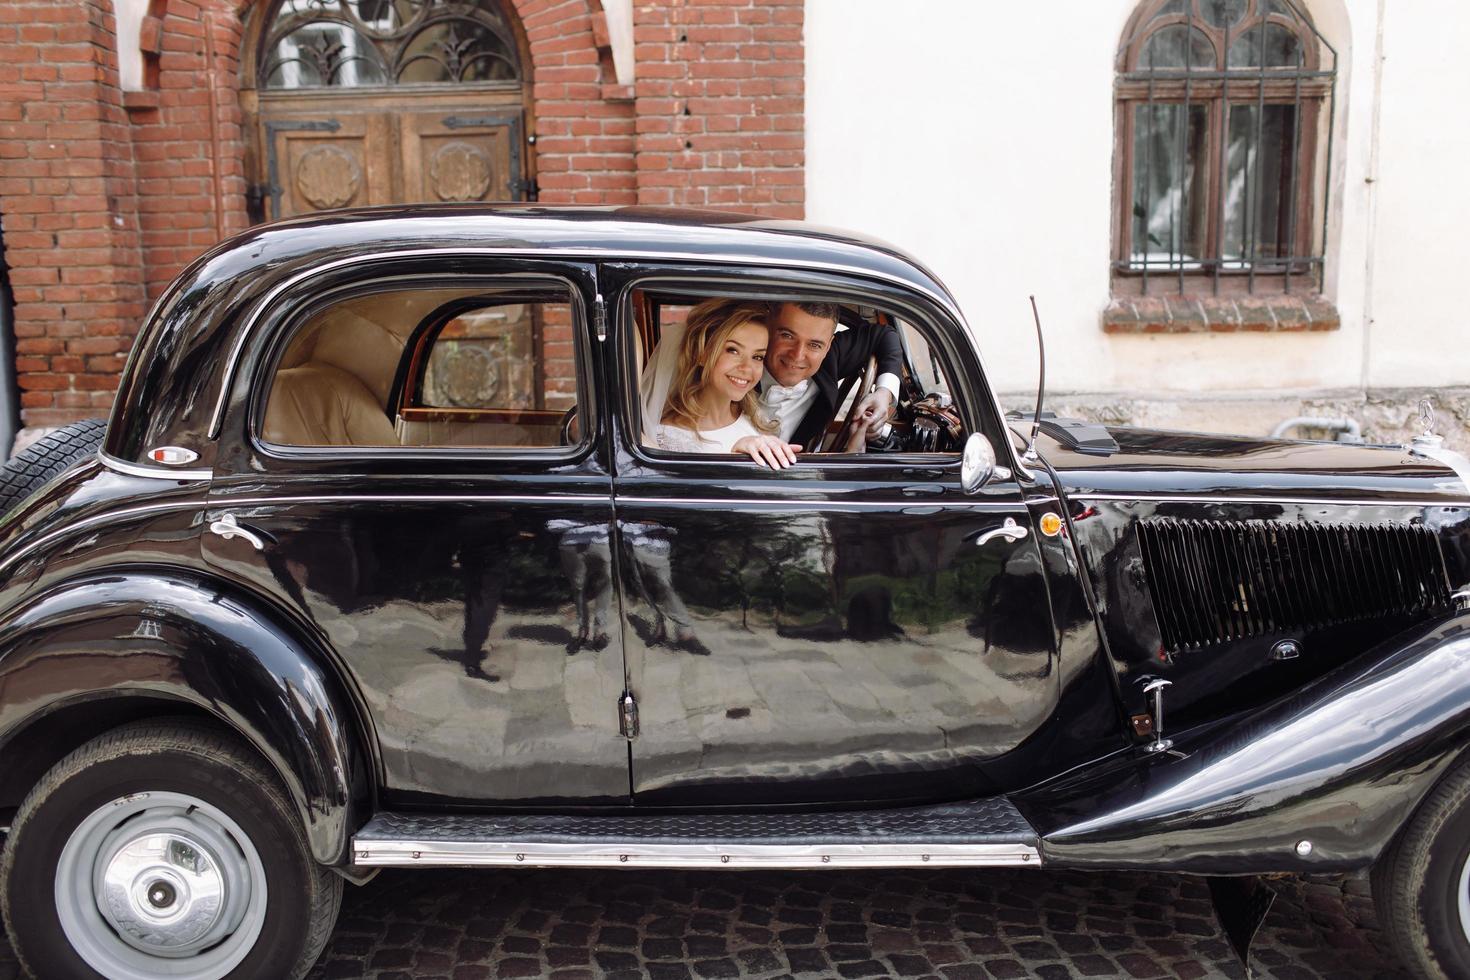 Classy wedding couple smiles in retro car photo